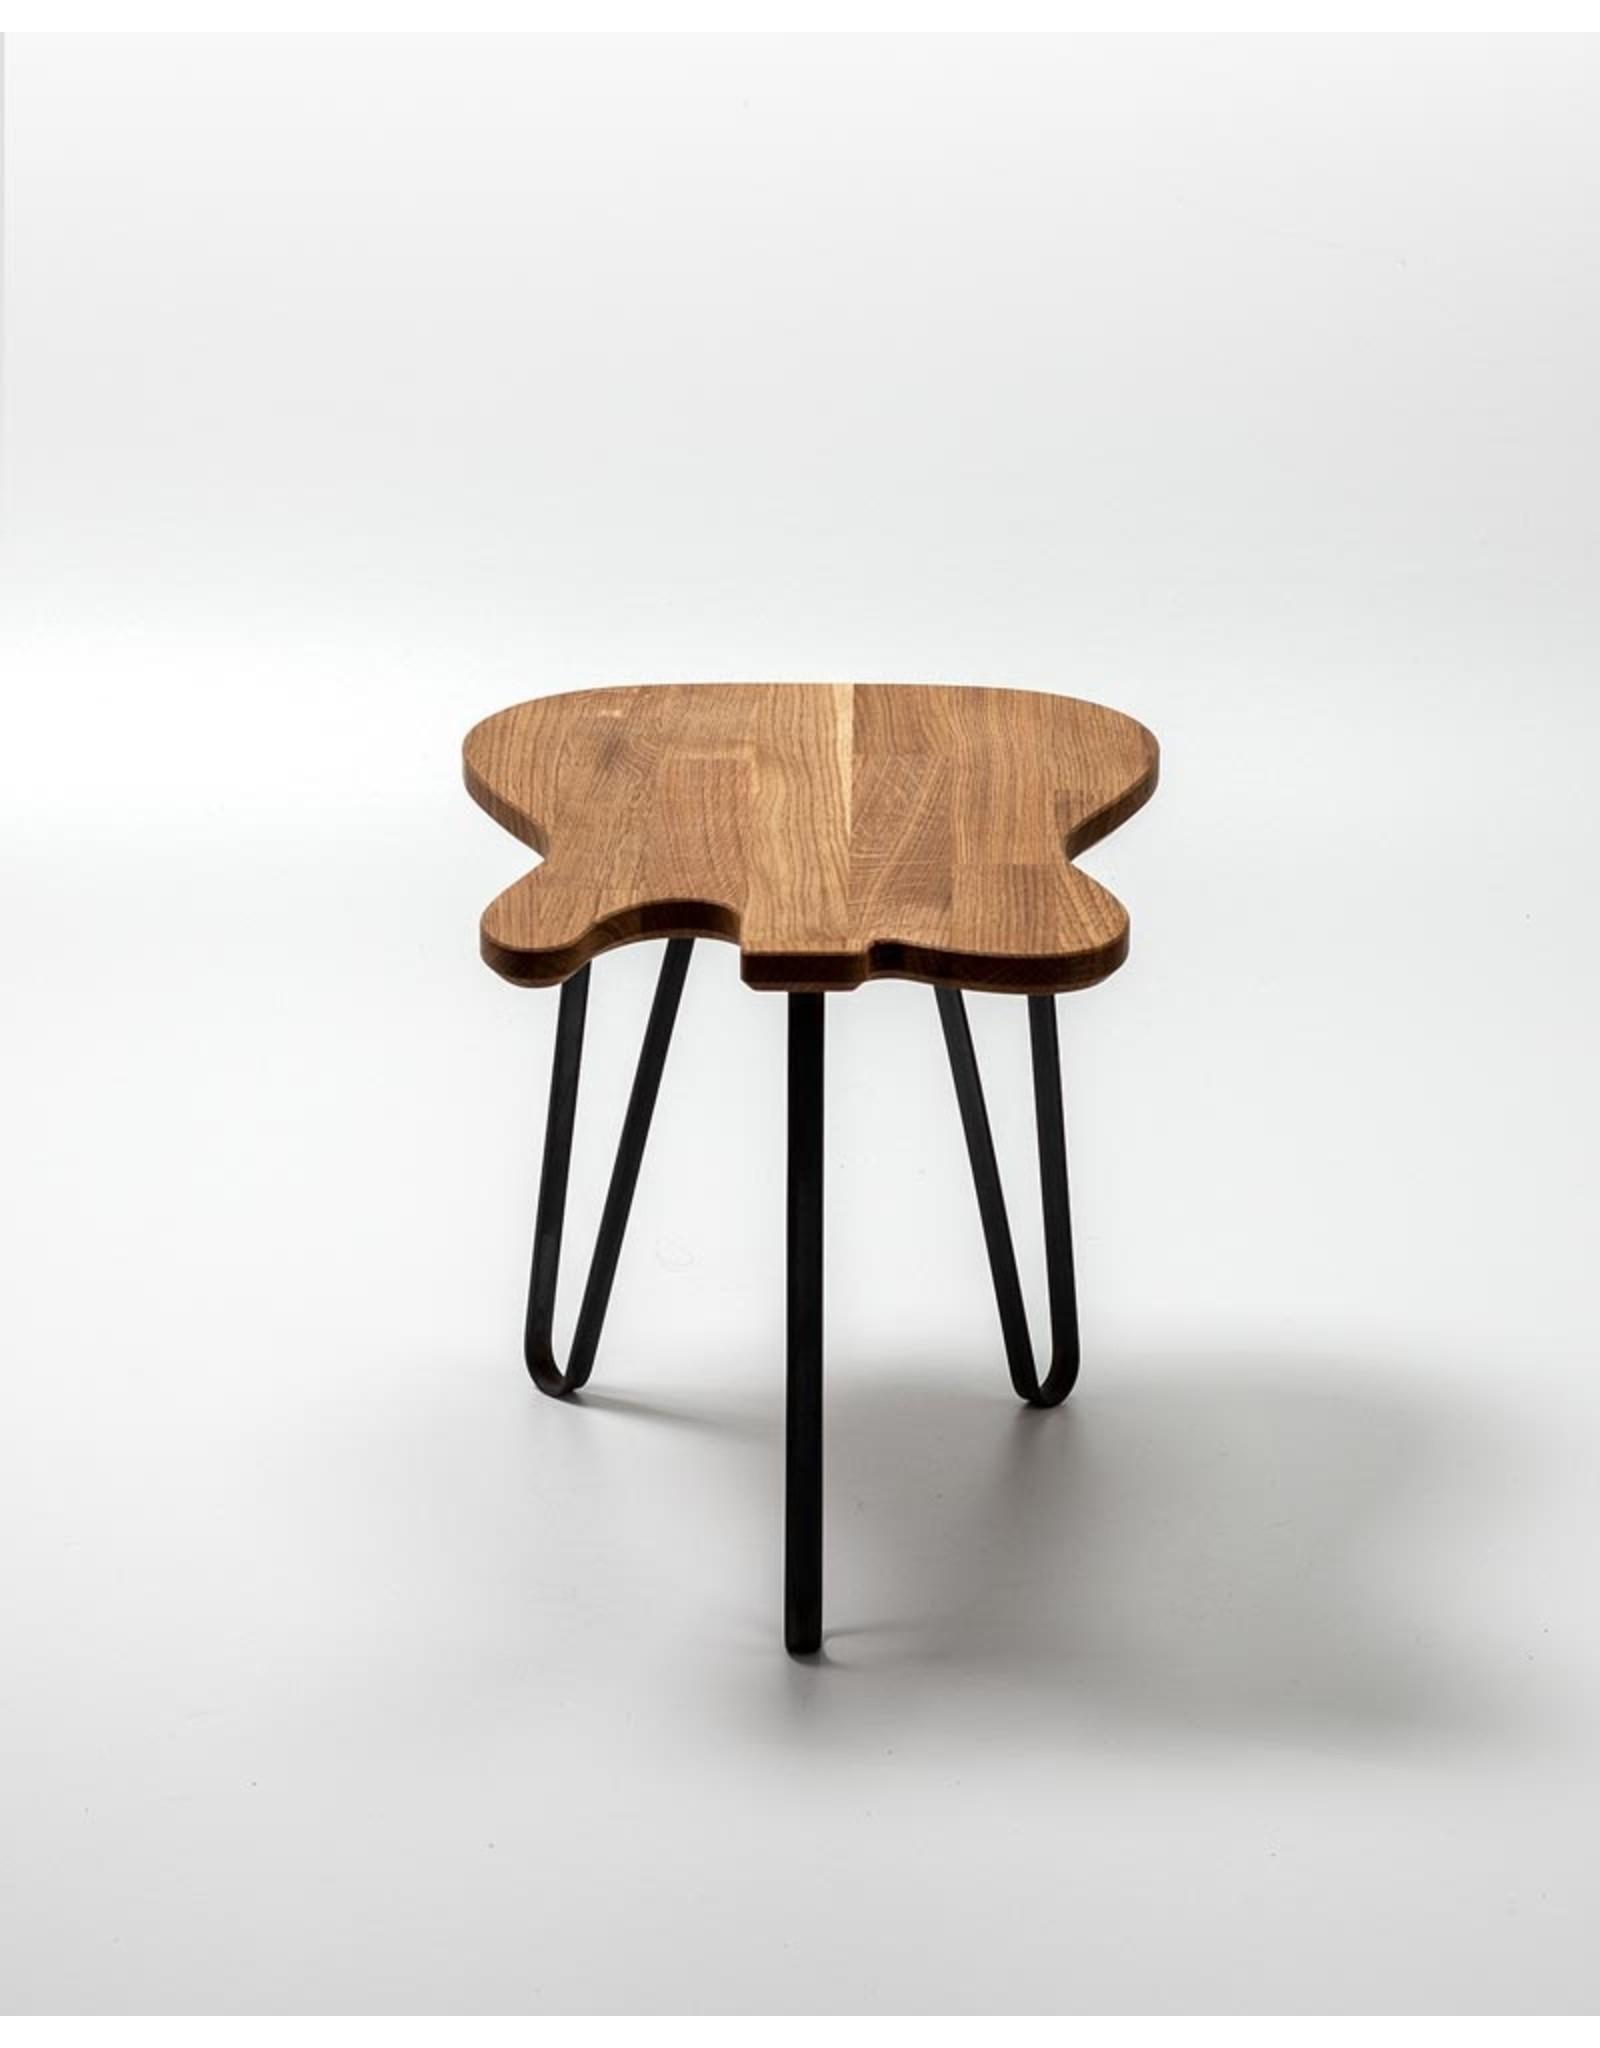 Ruwdesign Ruwdesign Coffee Table T-Model